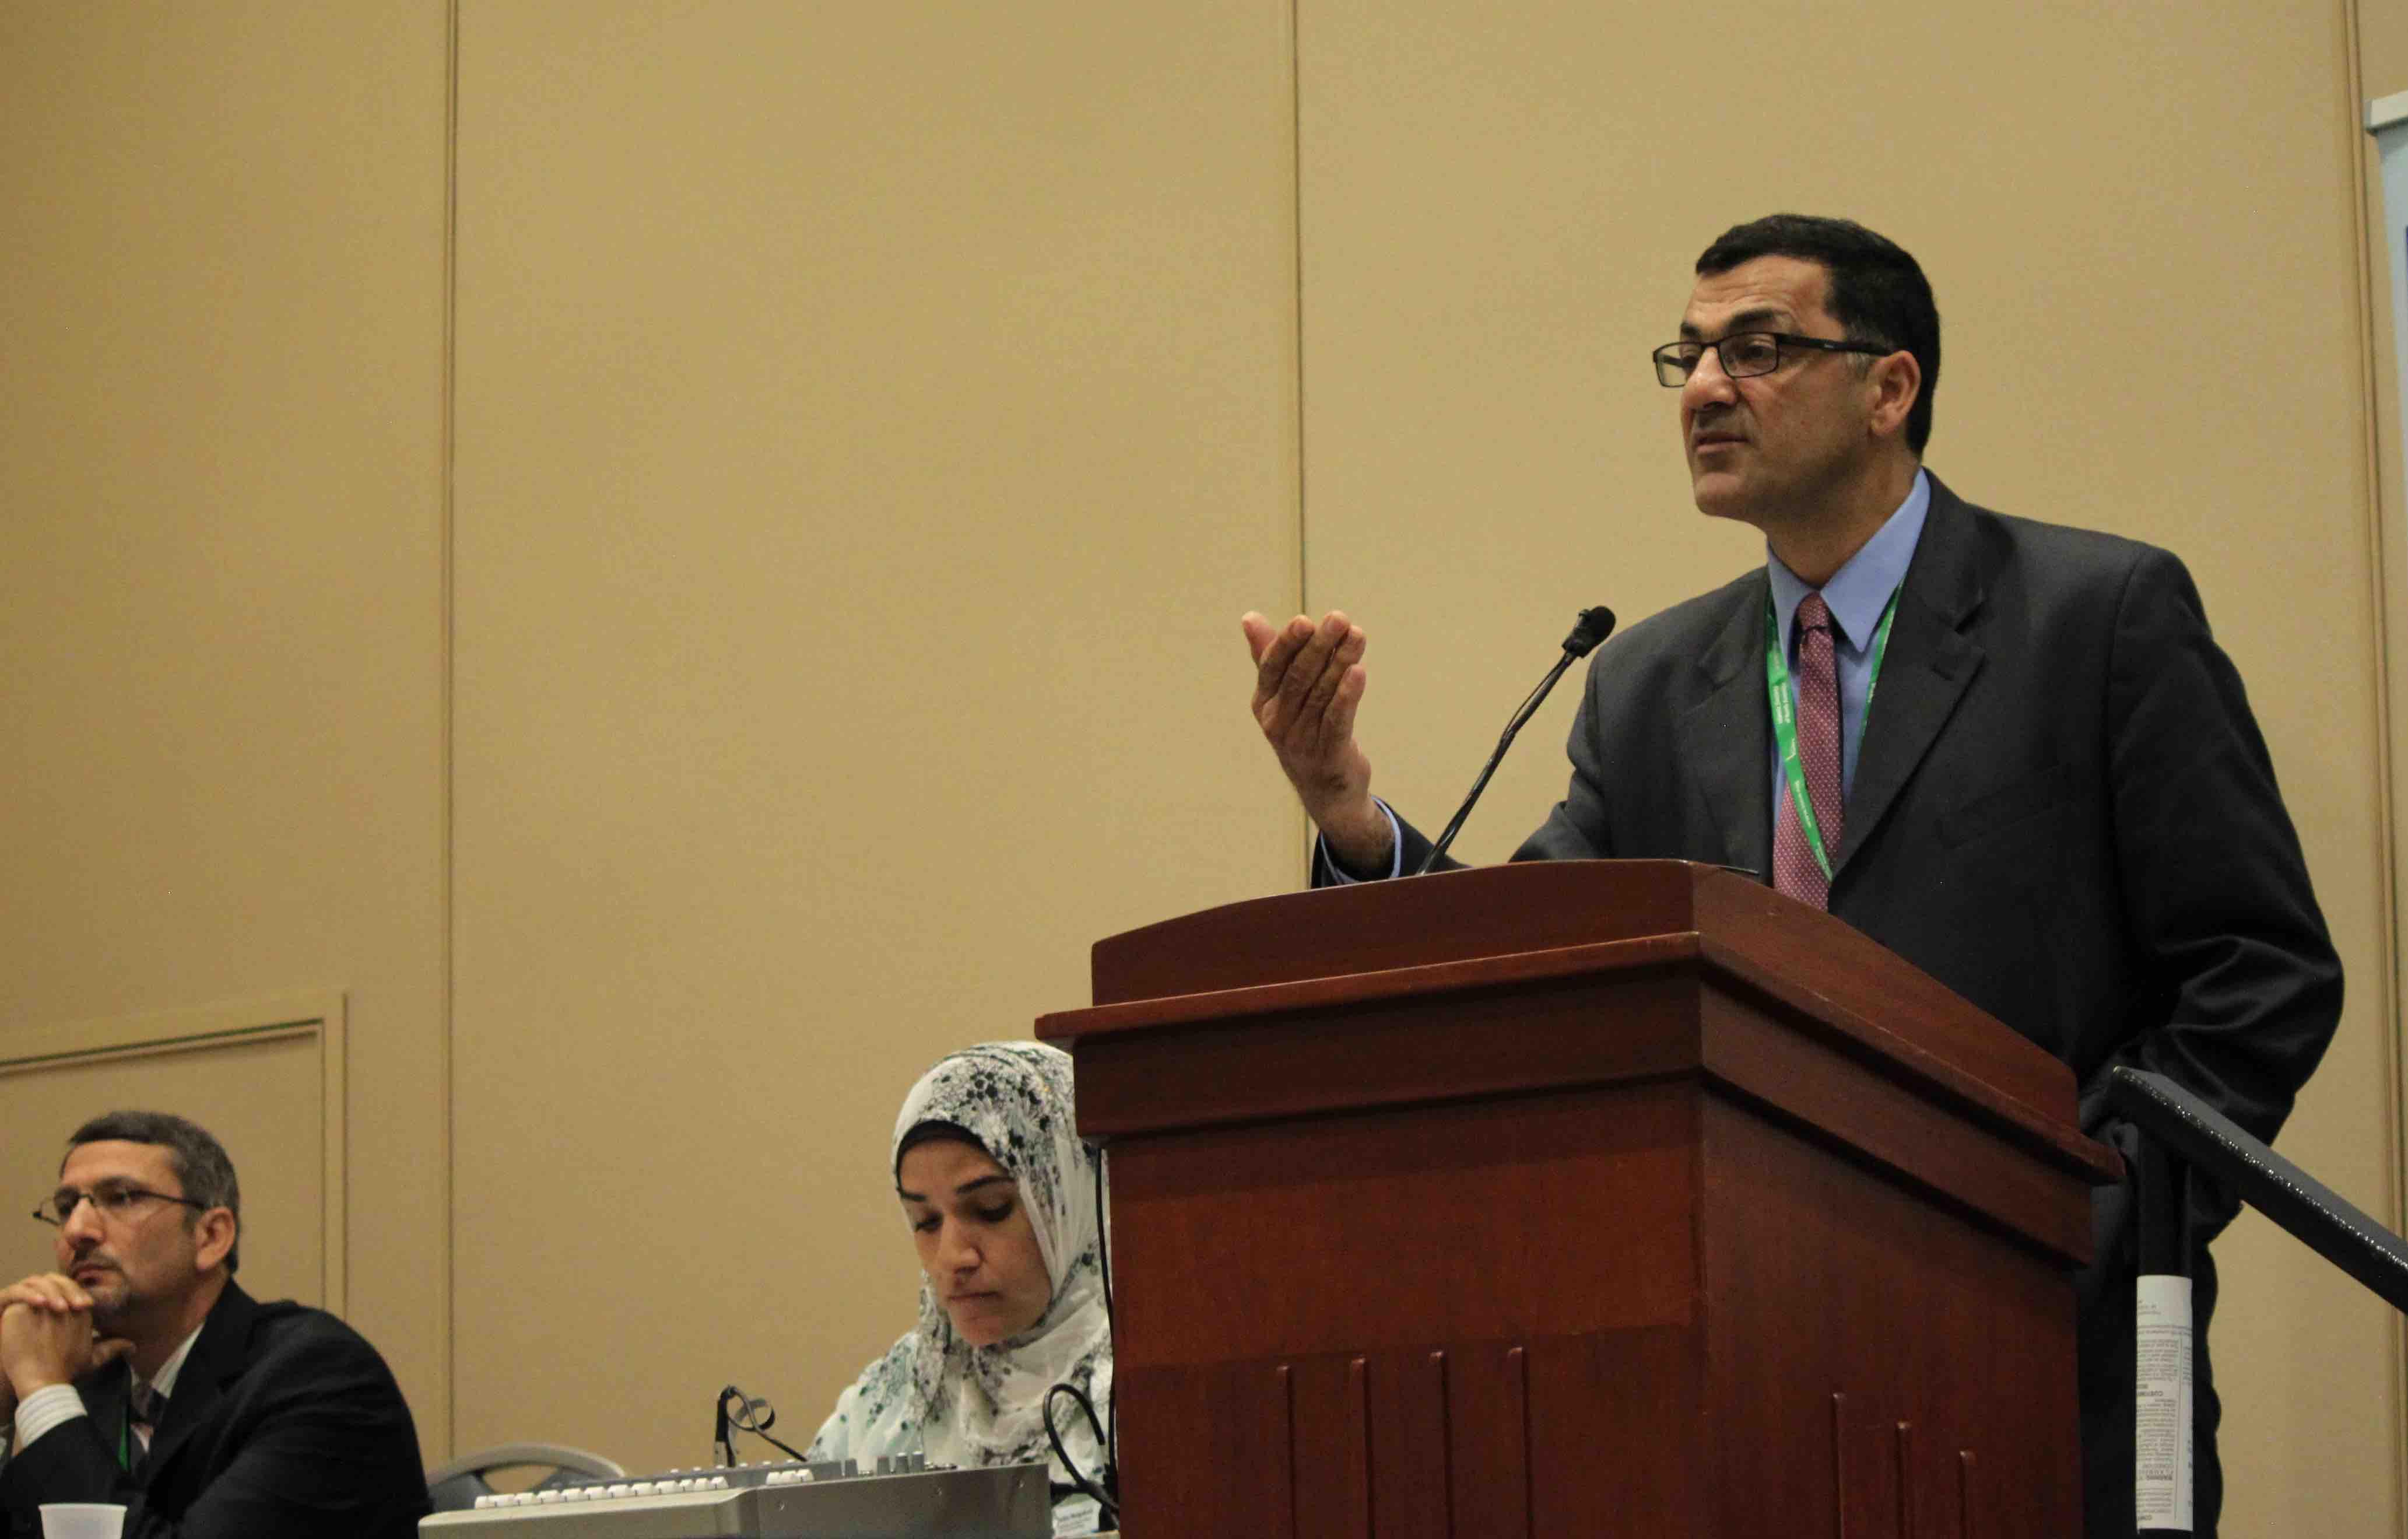 Debate participant Salam Al-Marayati at the podium explaining his perspective